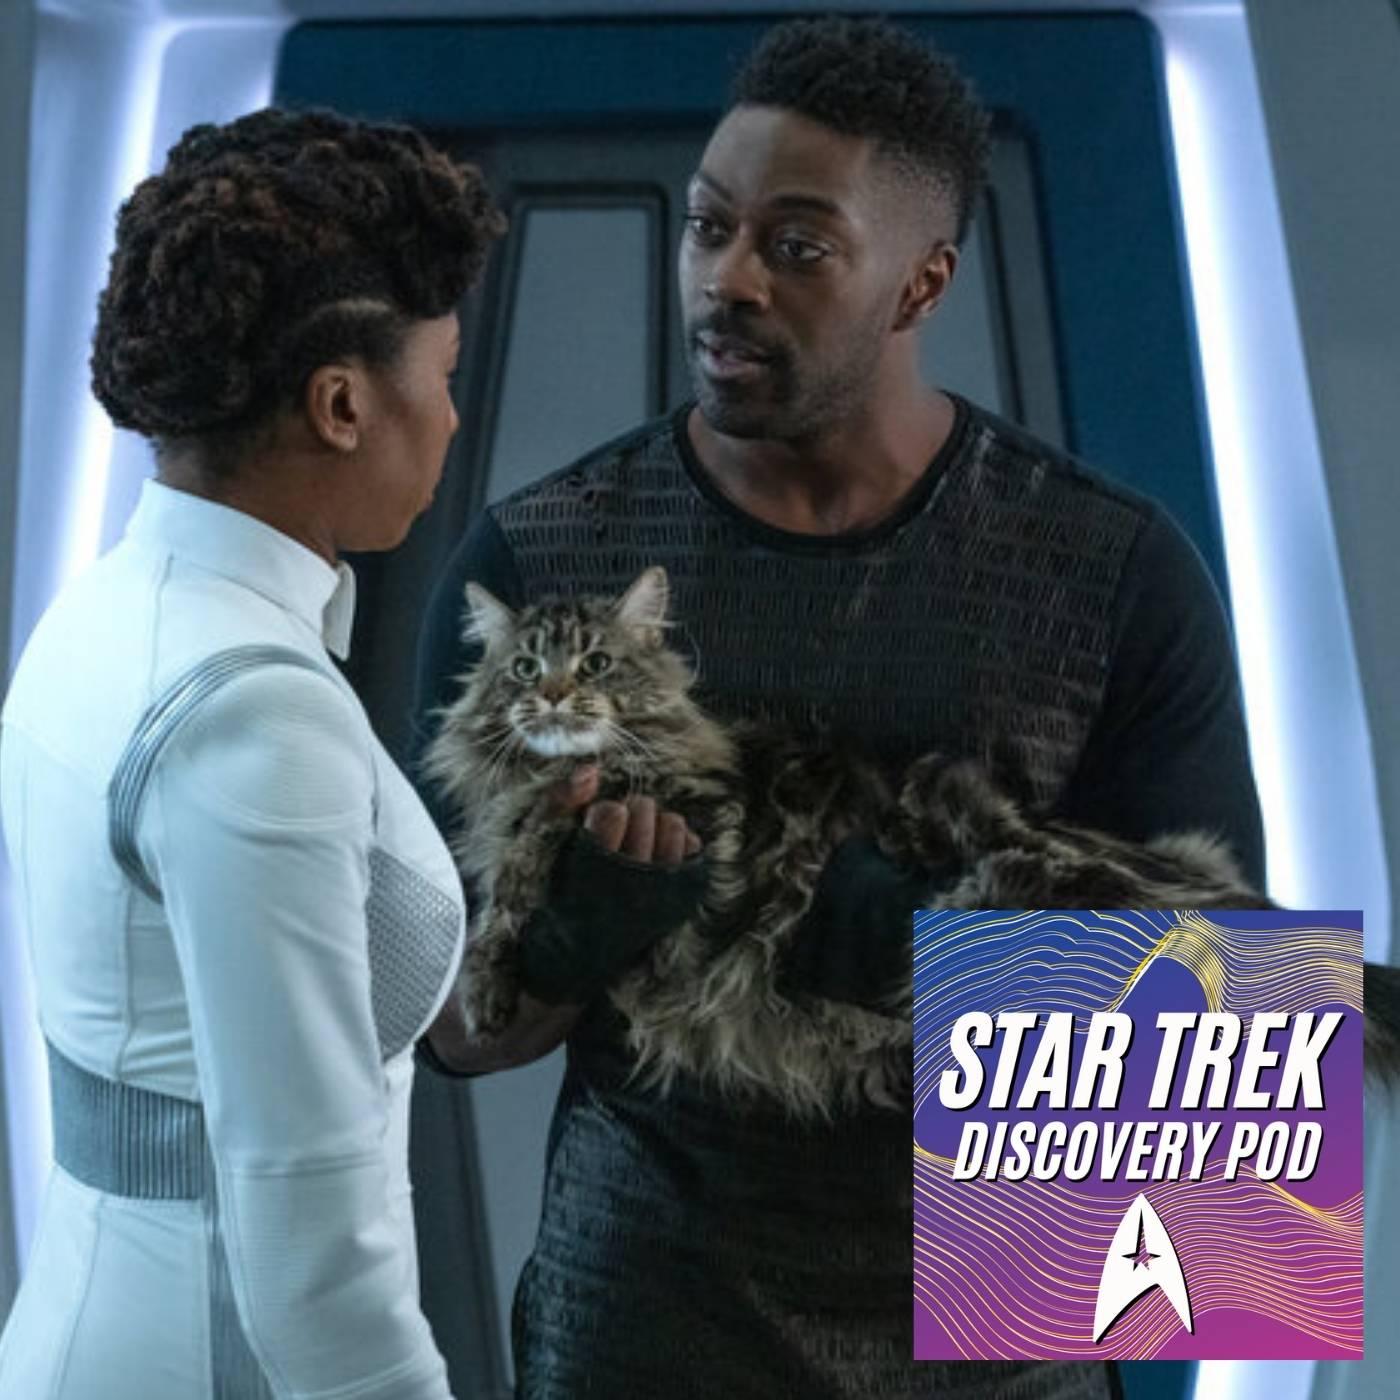 Star Trek Discovery Season 3 Episode 11 'Su'Kal' Review